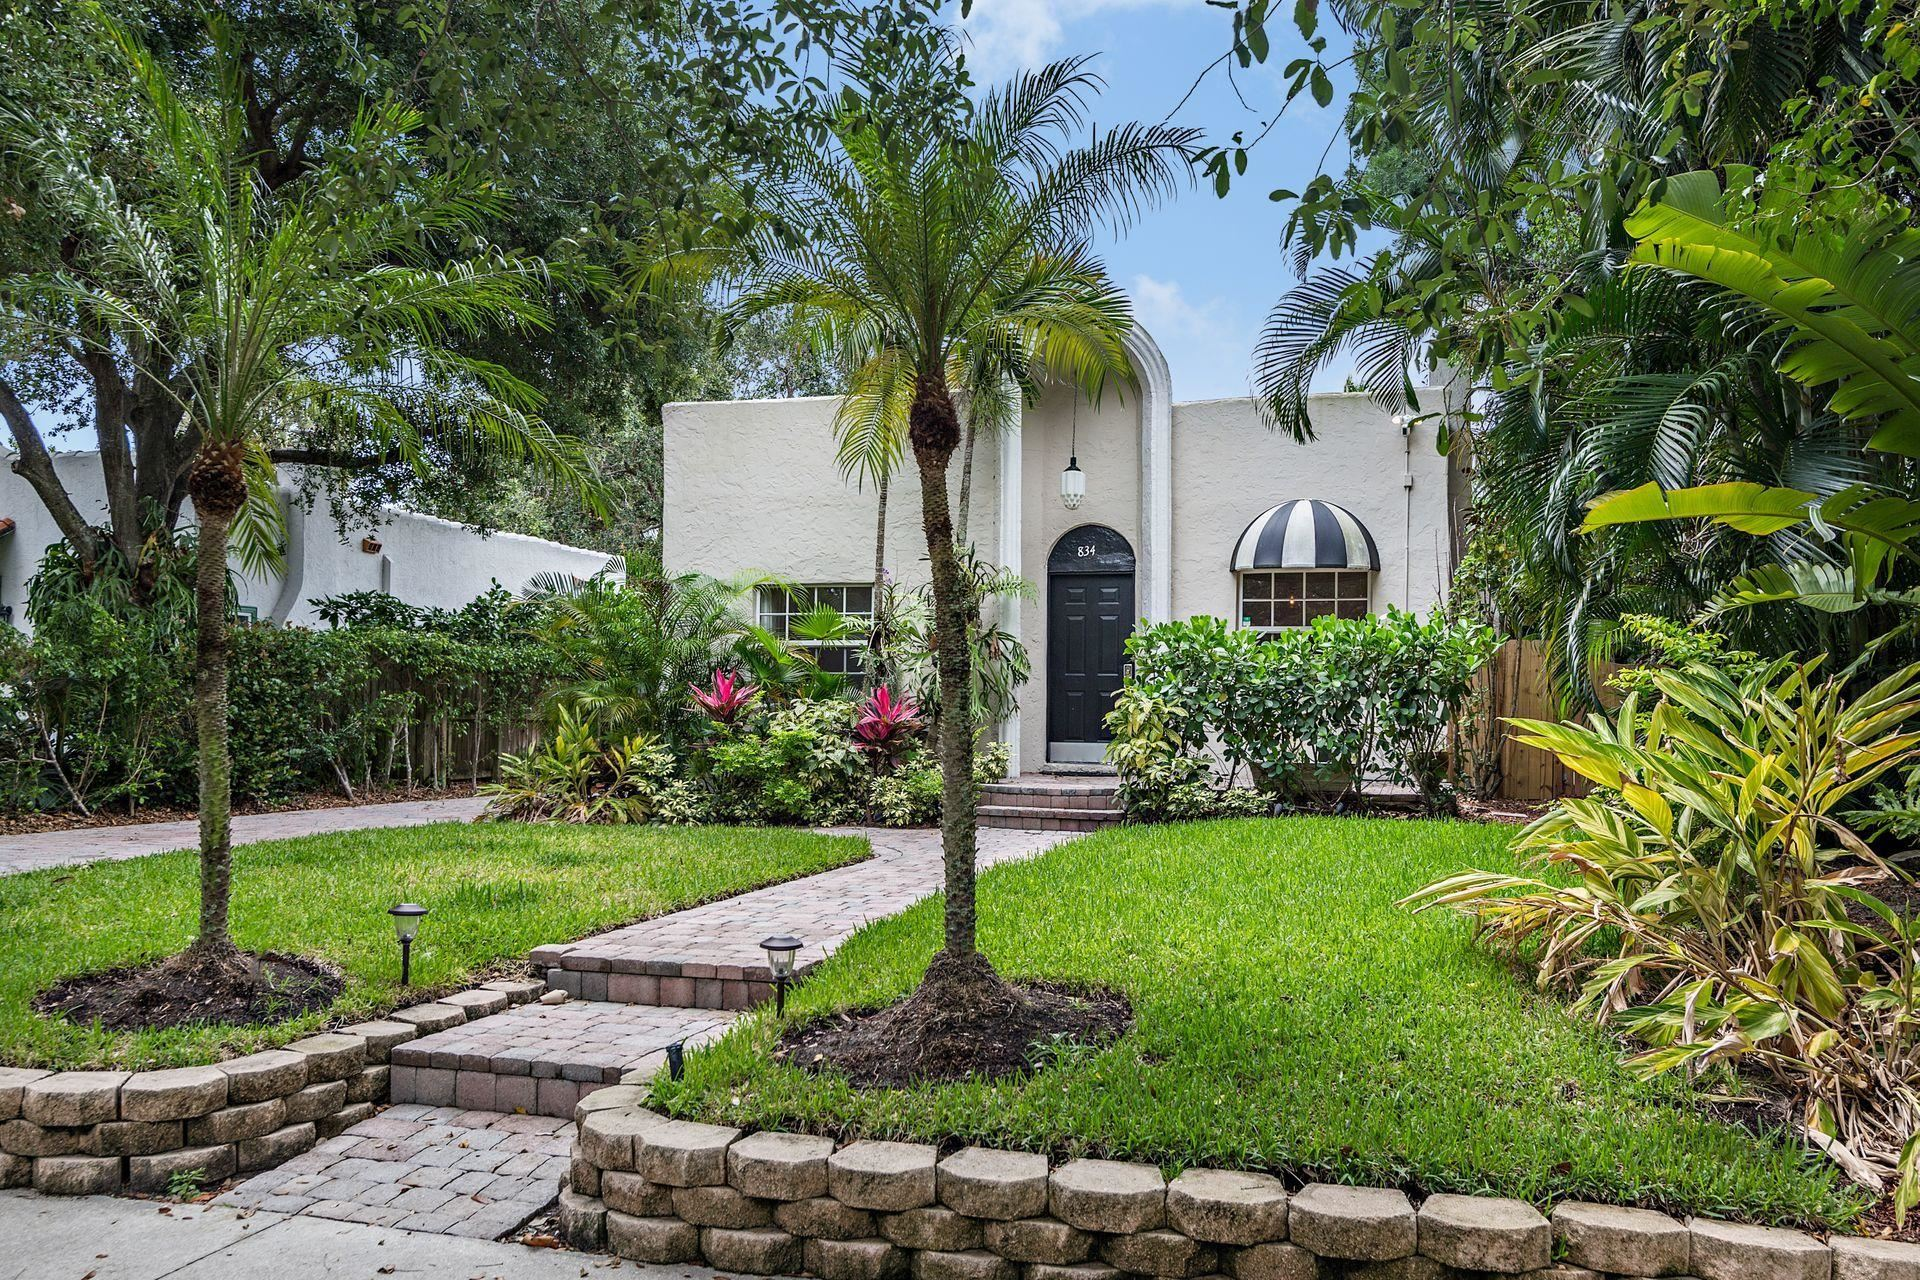 834 Upland Road, West Palm Beach, FL 33401 - #: RX-10626178